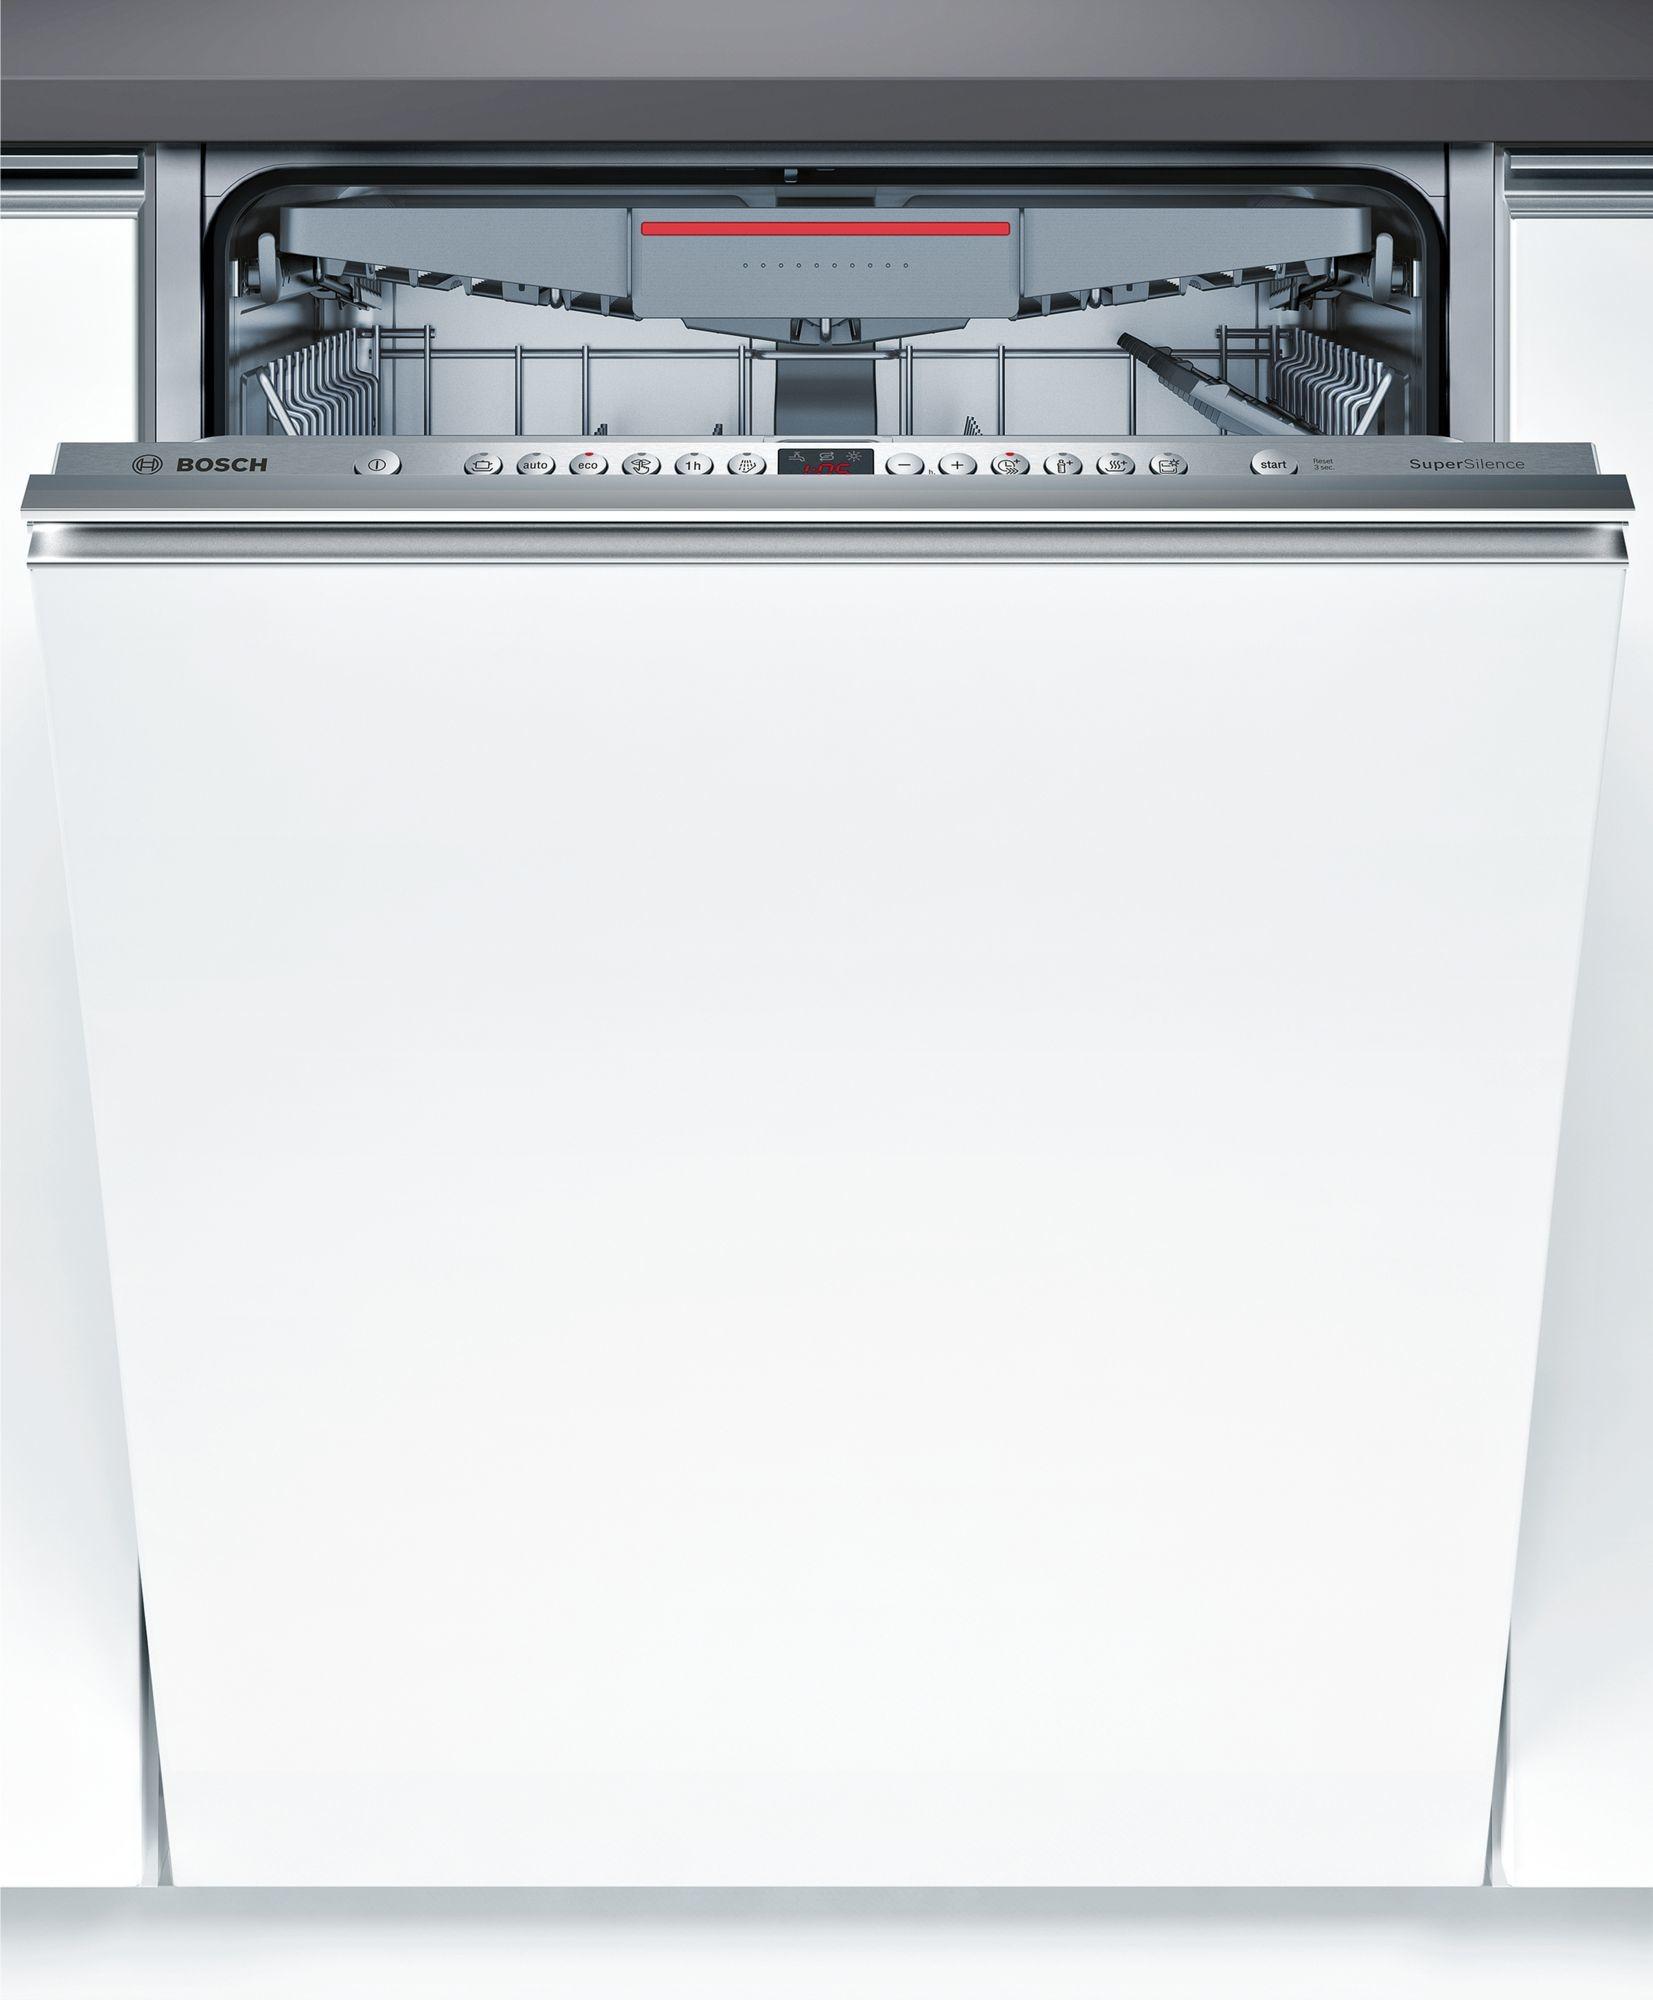 Bosch SBE46NX23E vaatwasser - Prijsvergelijk